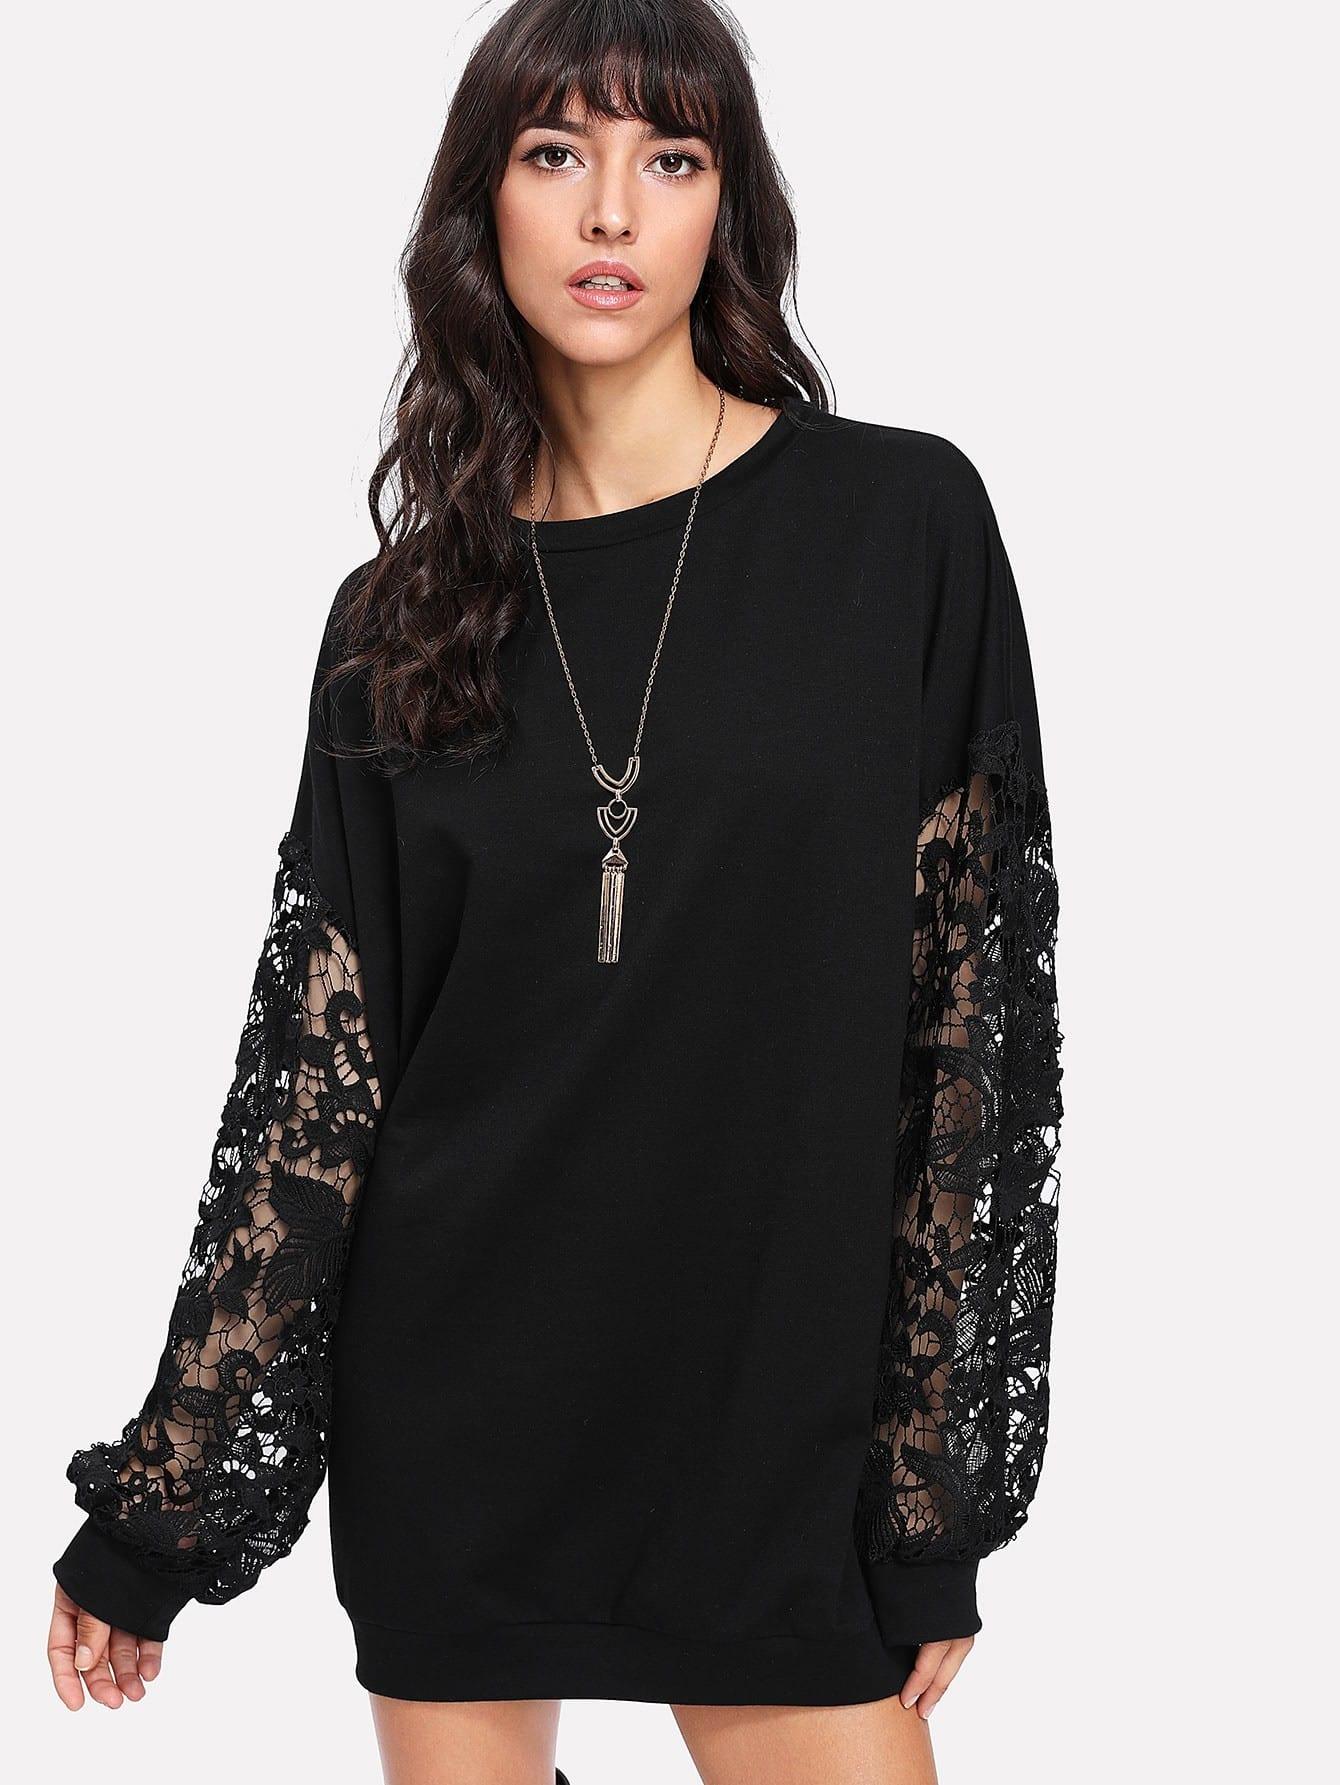 Contrast Floral Lace Sleeve Longline Sweatshirt